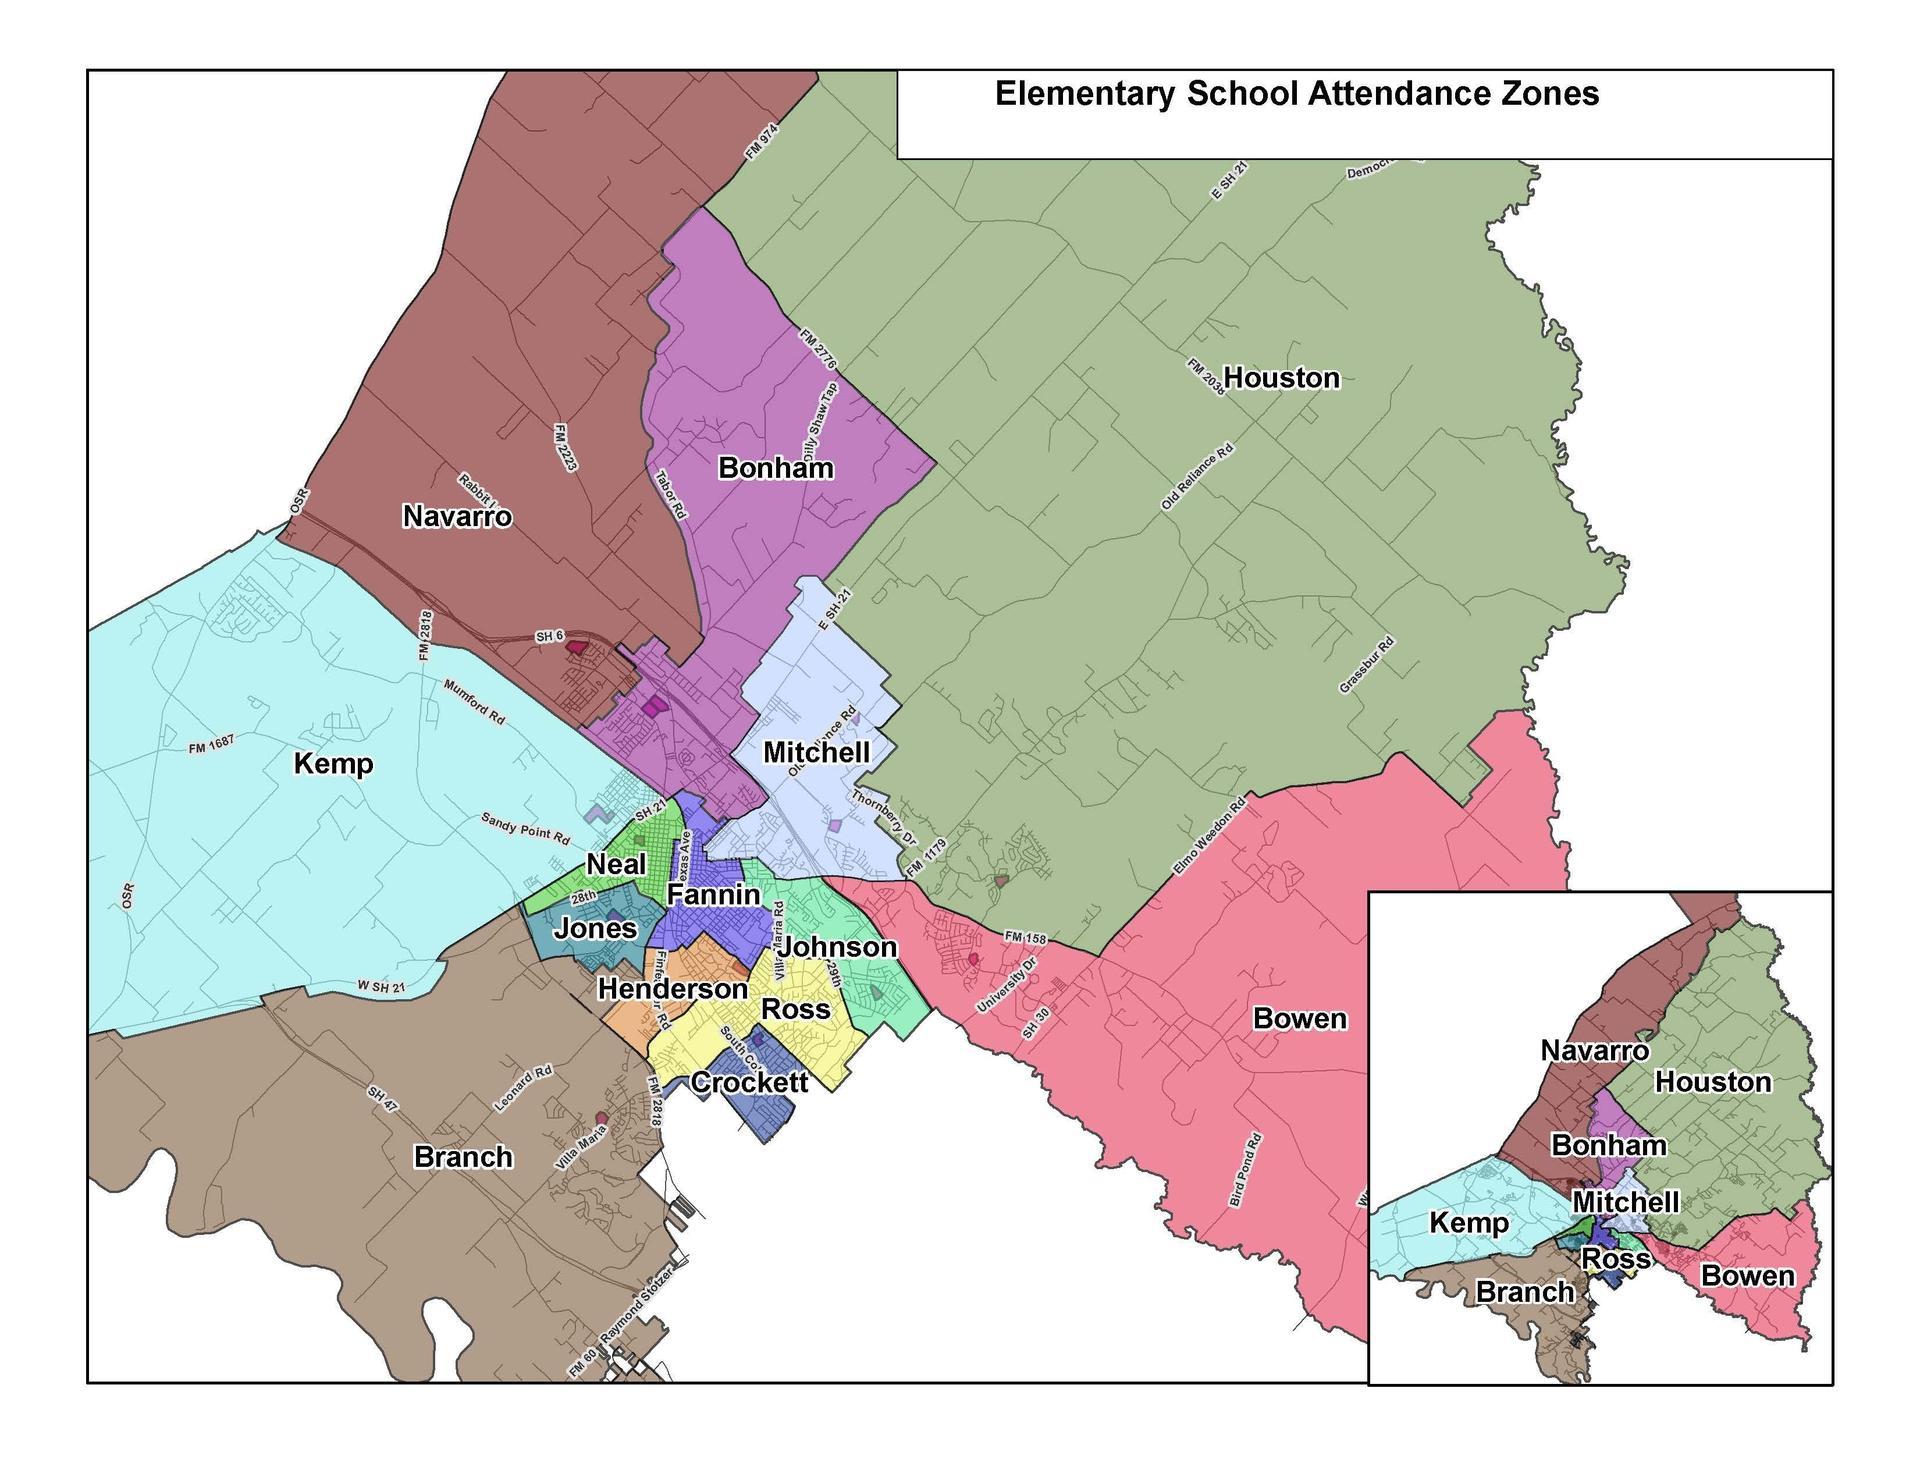 Elementary Attendance Zones